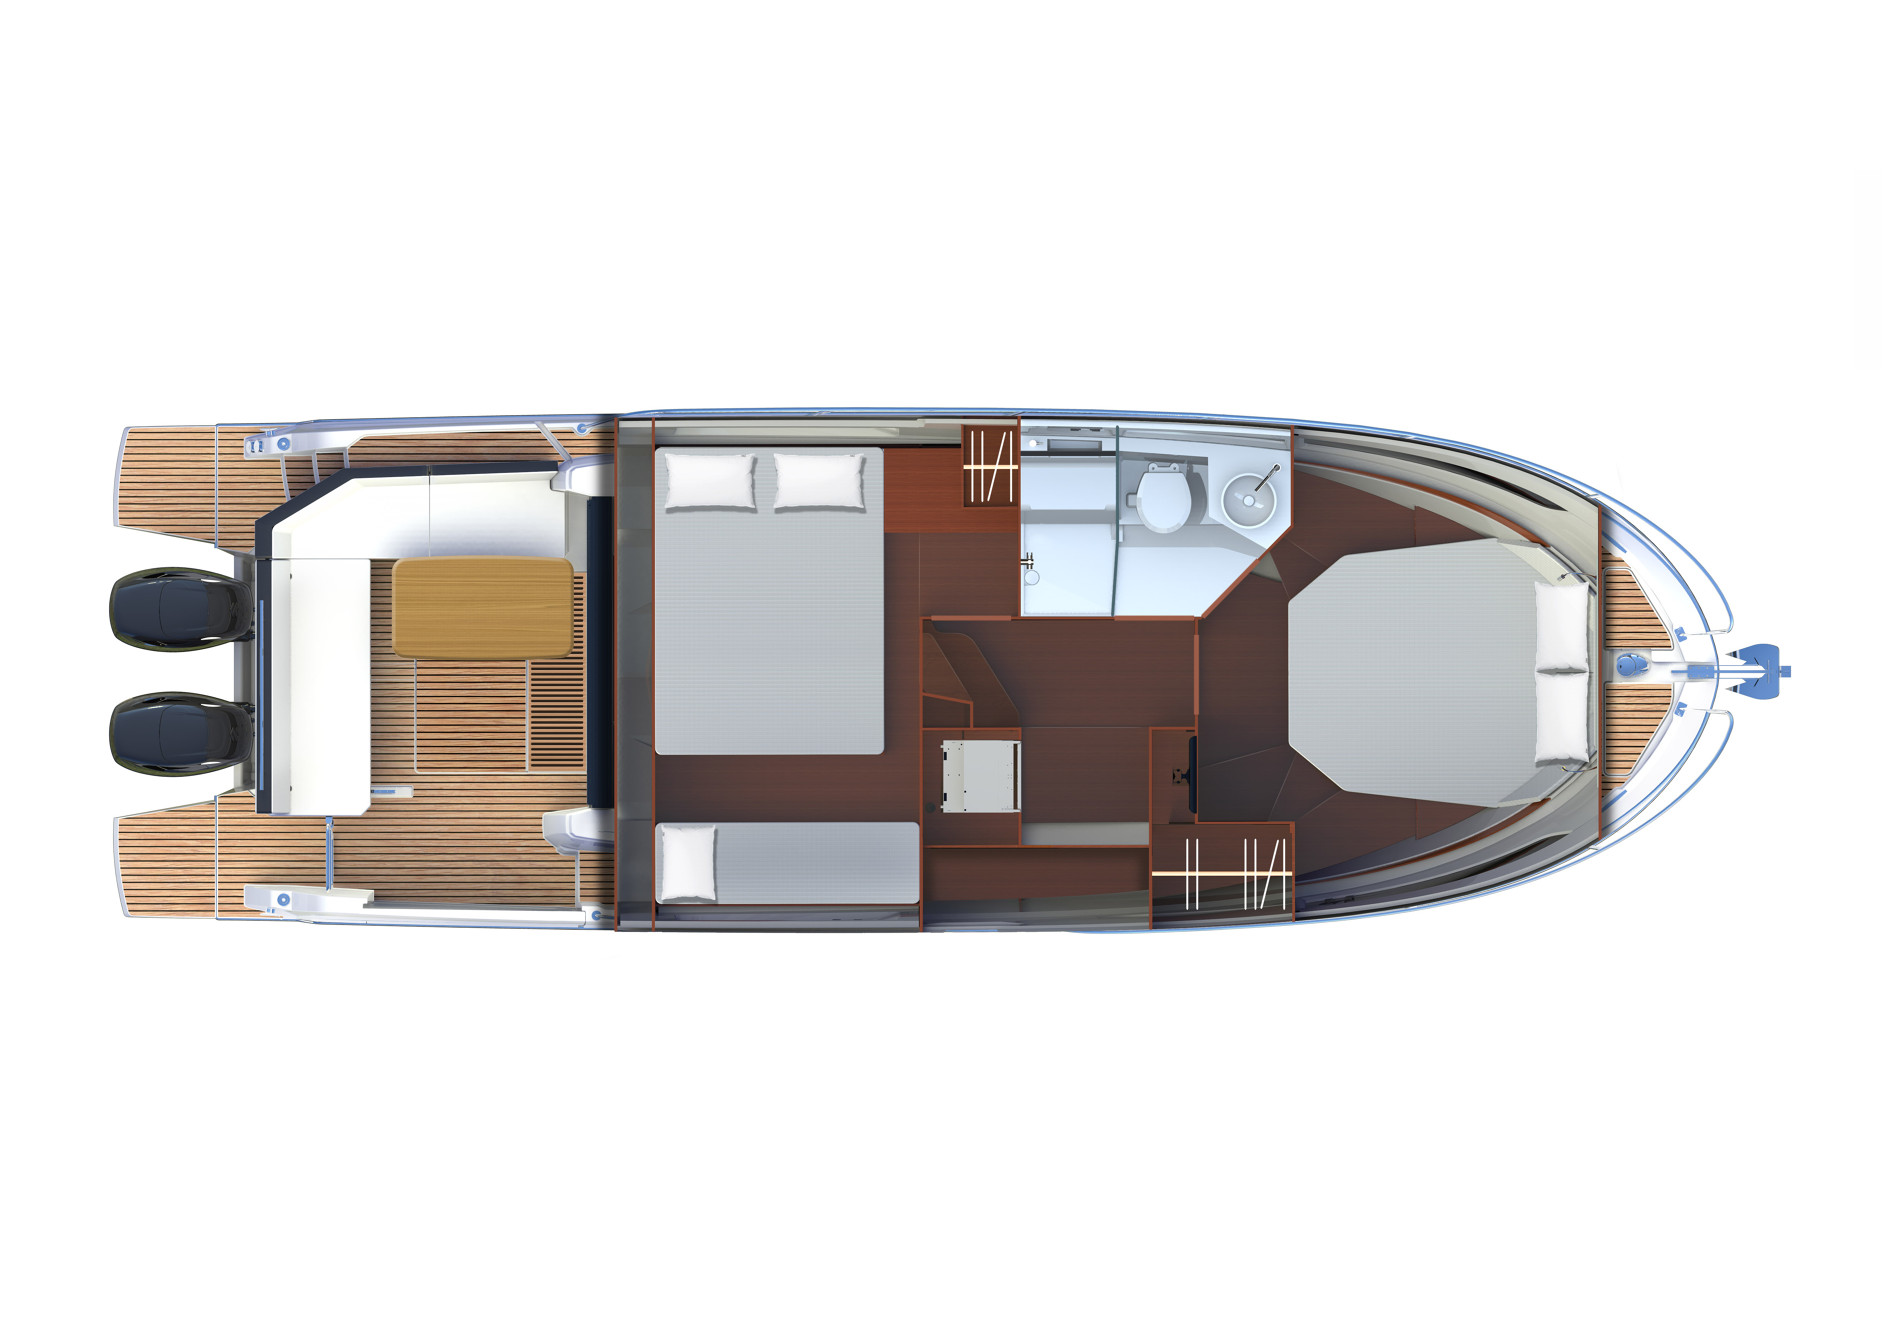 A11---lower-deck.jpg-1900px